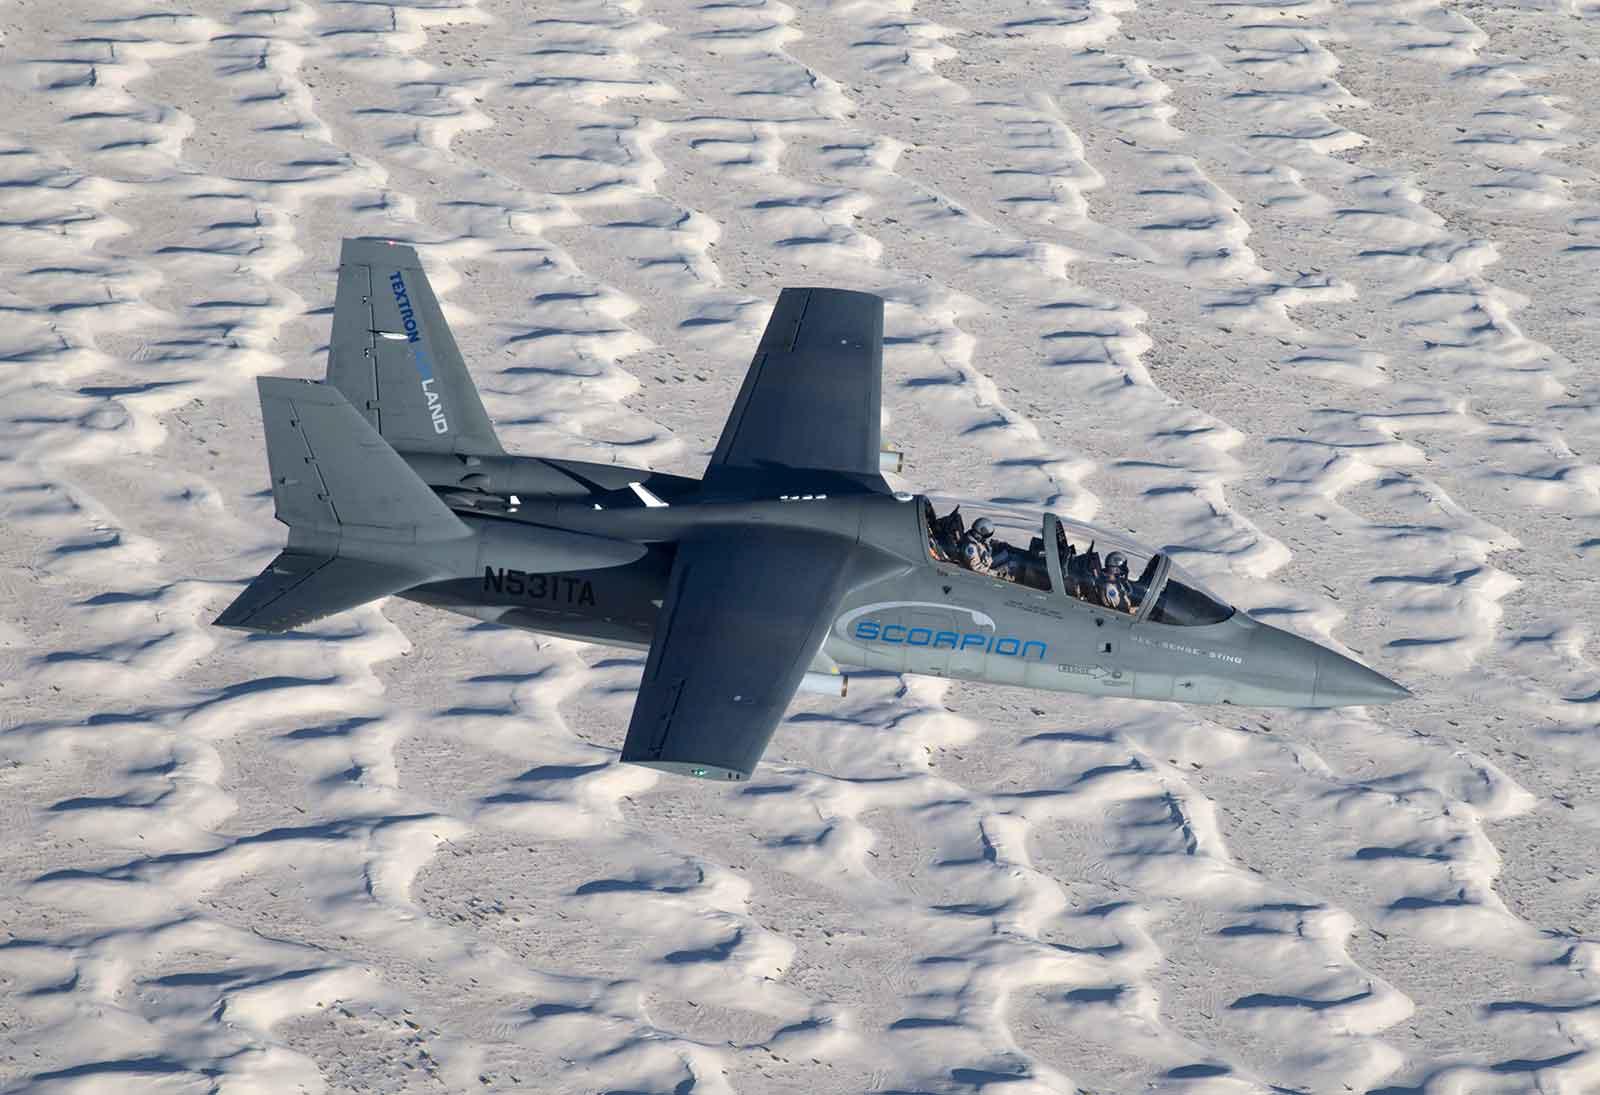 Scorpion Jet